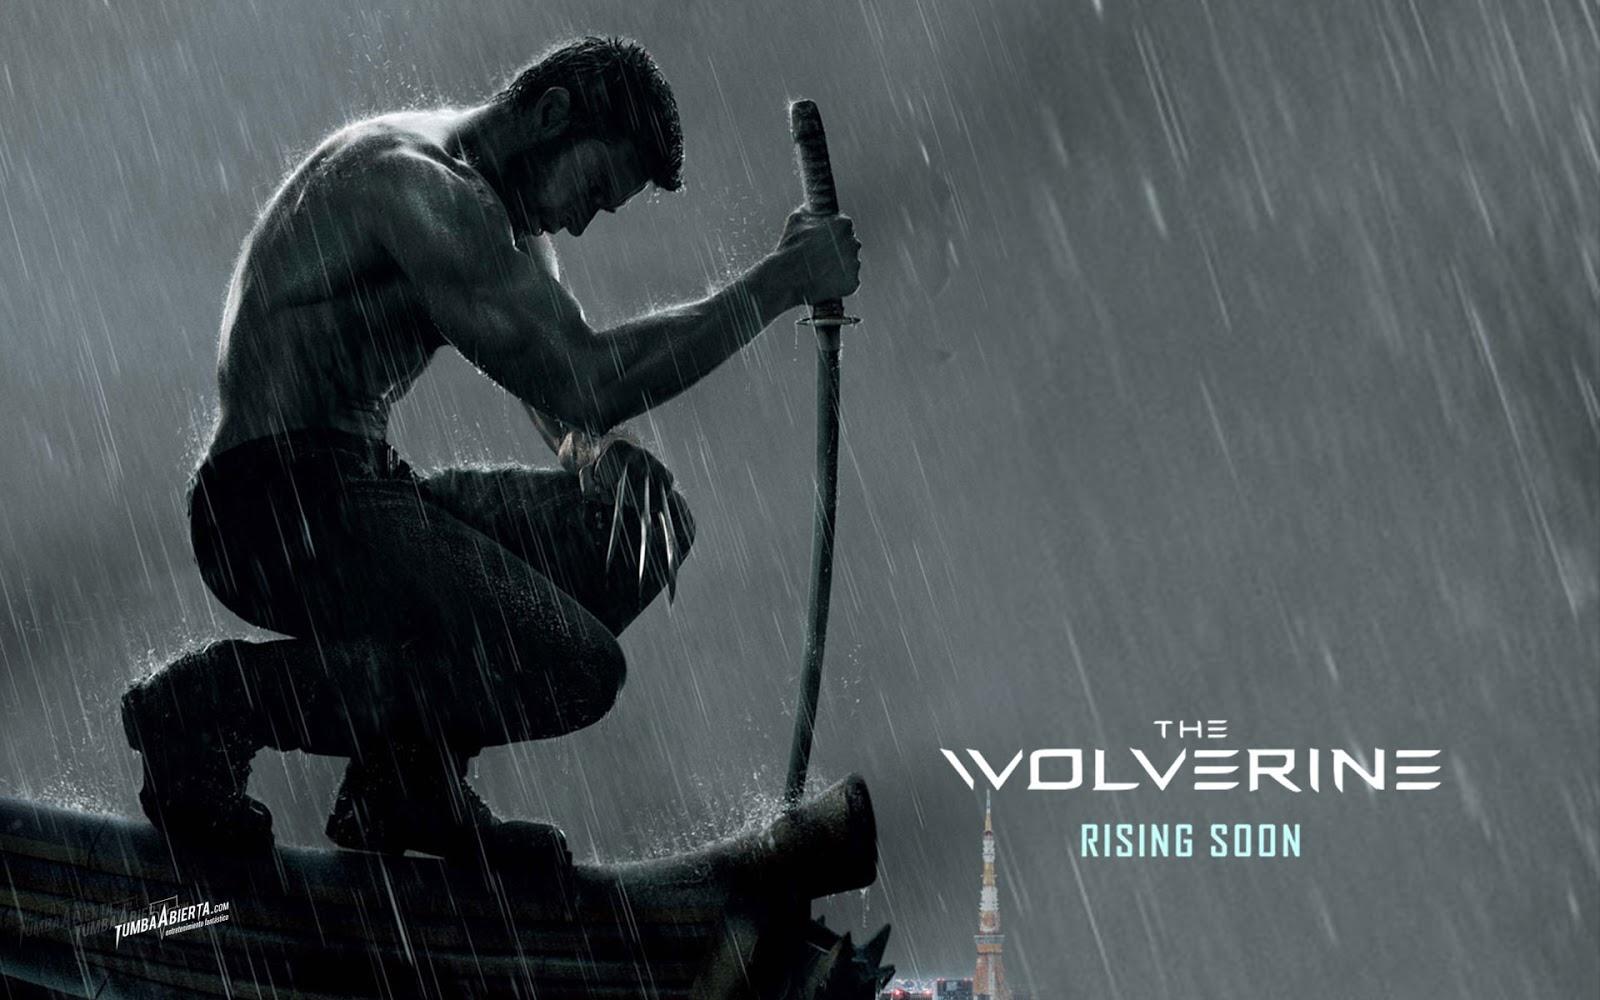 d893cdfd87a One Day At A Time: 'The Wolverine' & 'V/H/S 2' Reviews